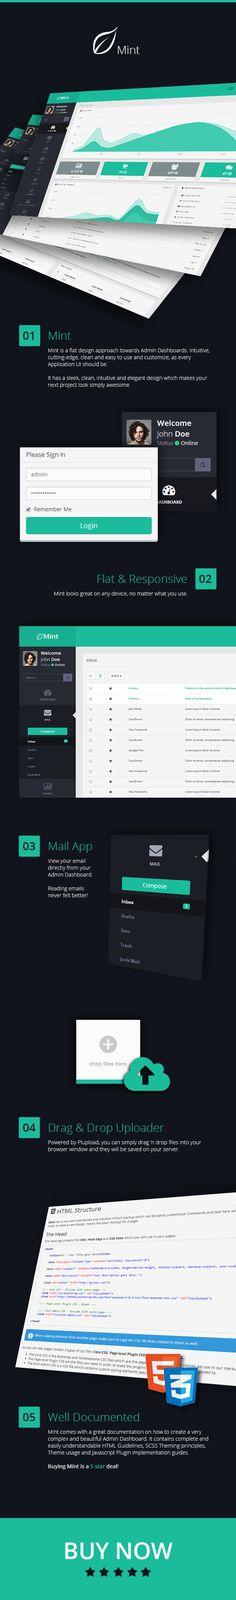 Mint - #Flat & #Responsive #Admin #Dashboard #Template